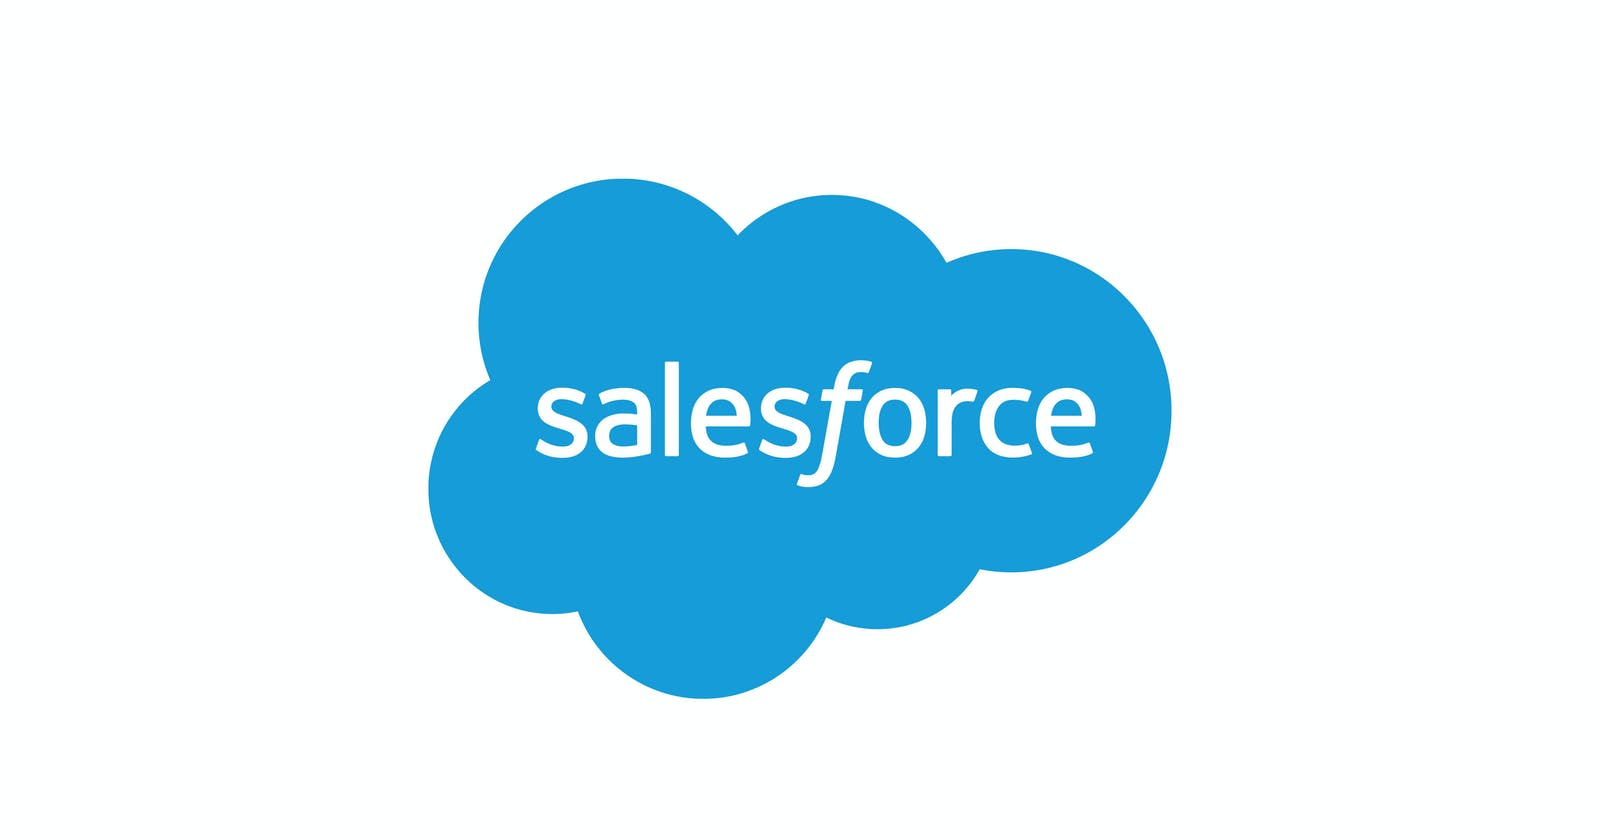 Self Reflection on SalesForce Workshop: